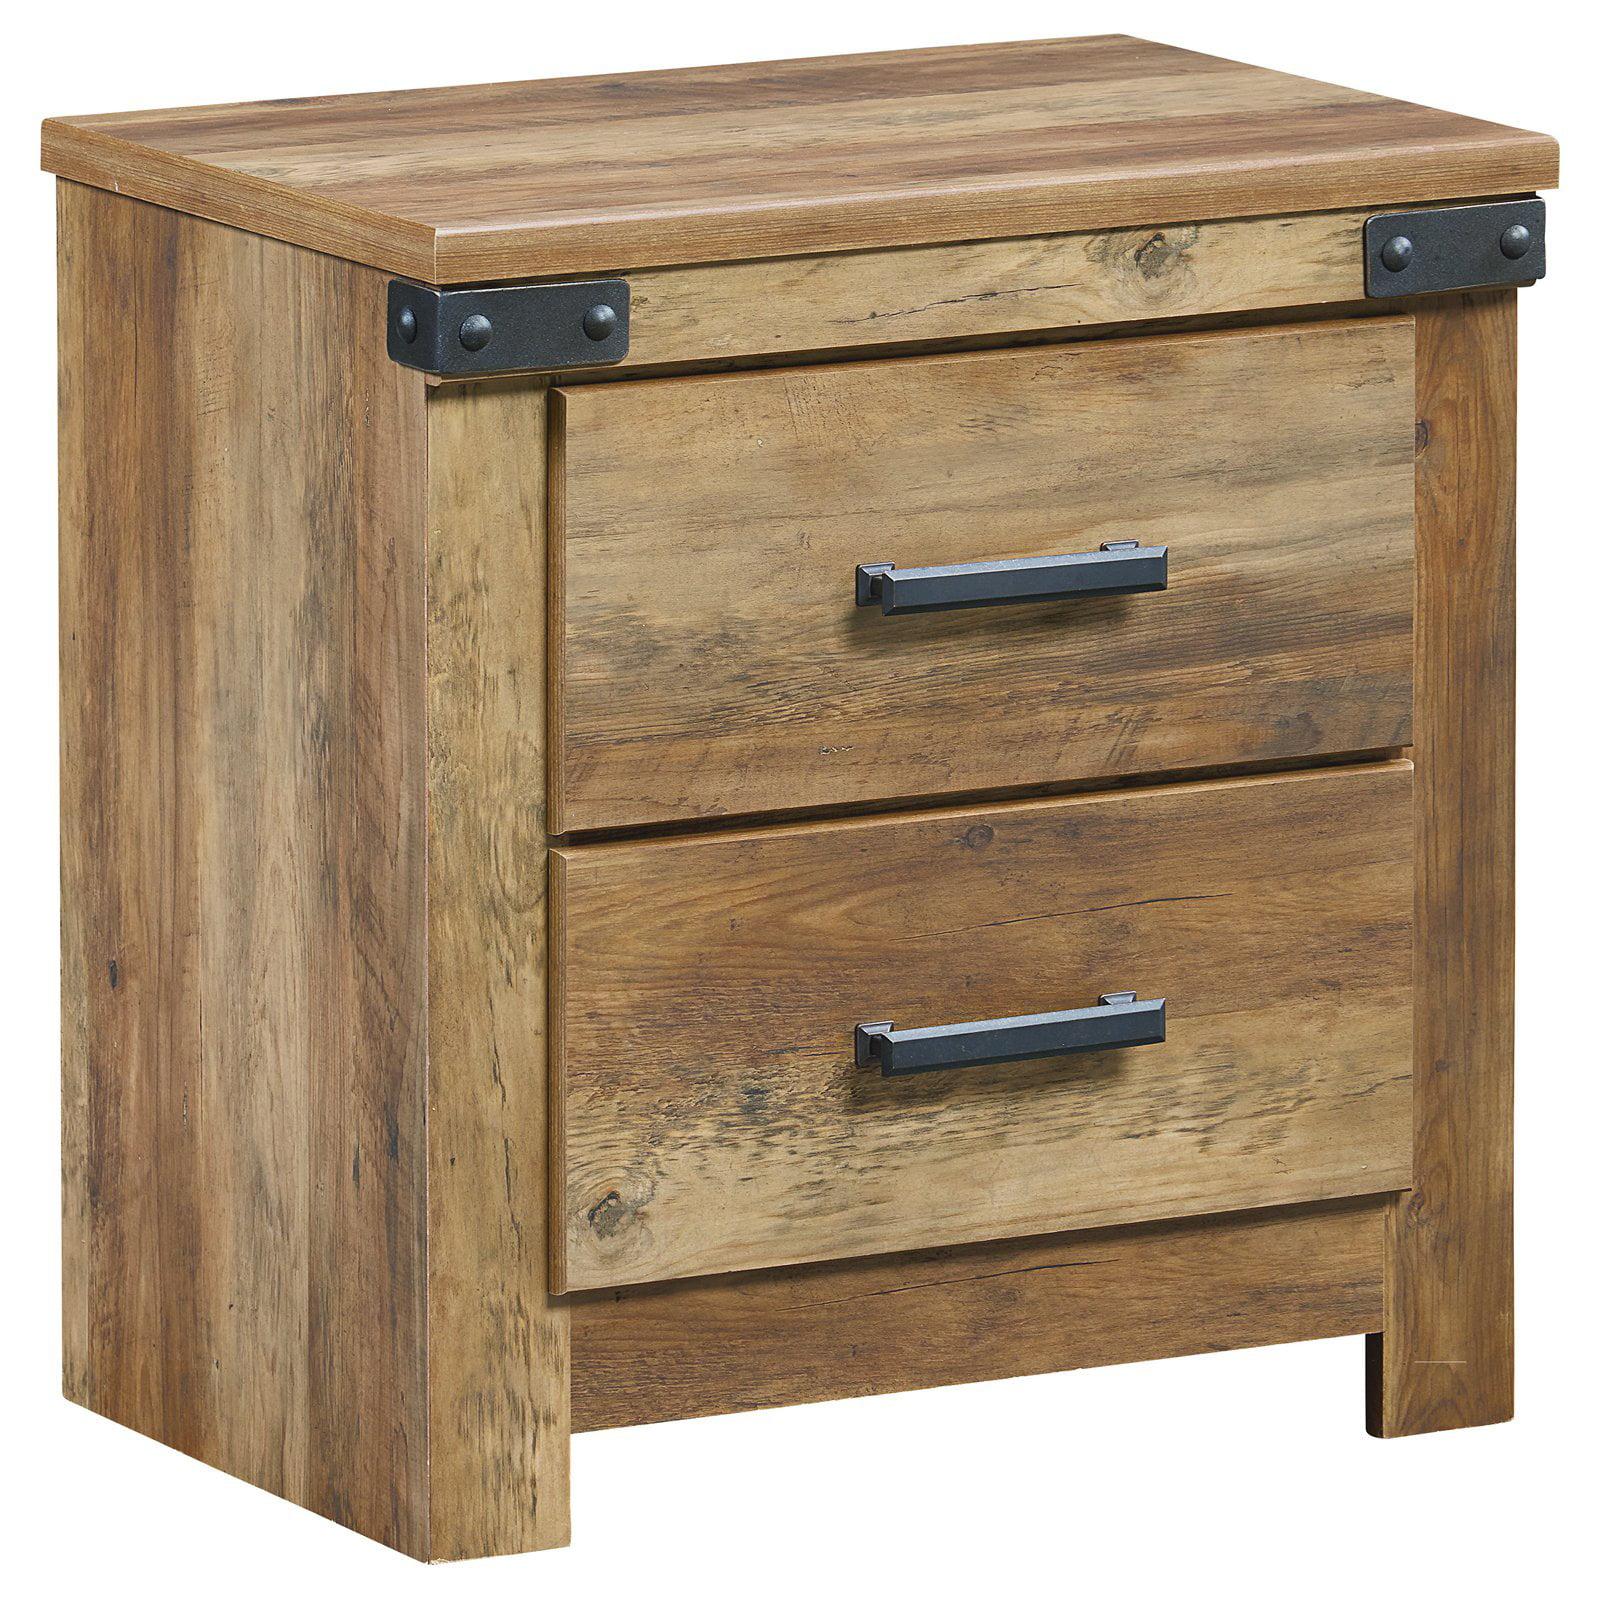 Standard Furniture Montana 2 Drawer Nightstand